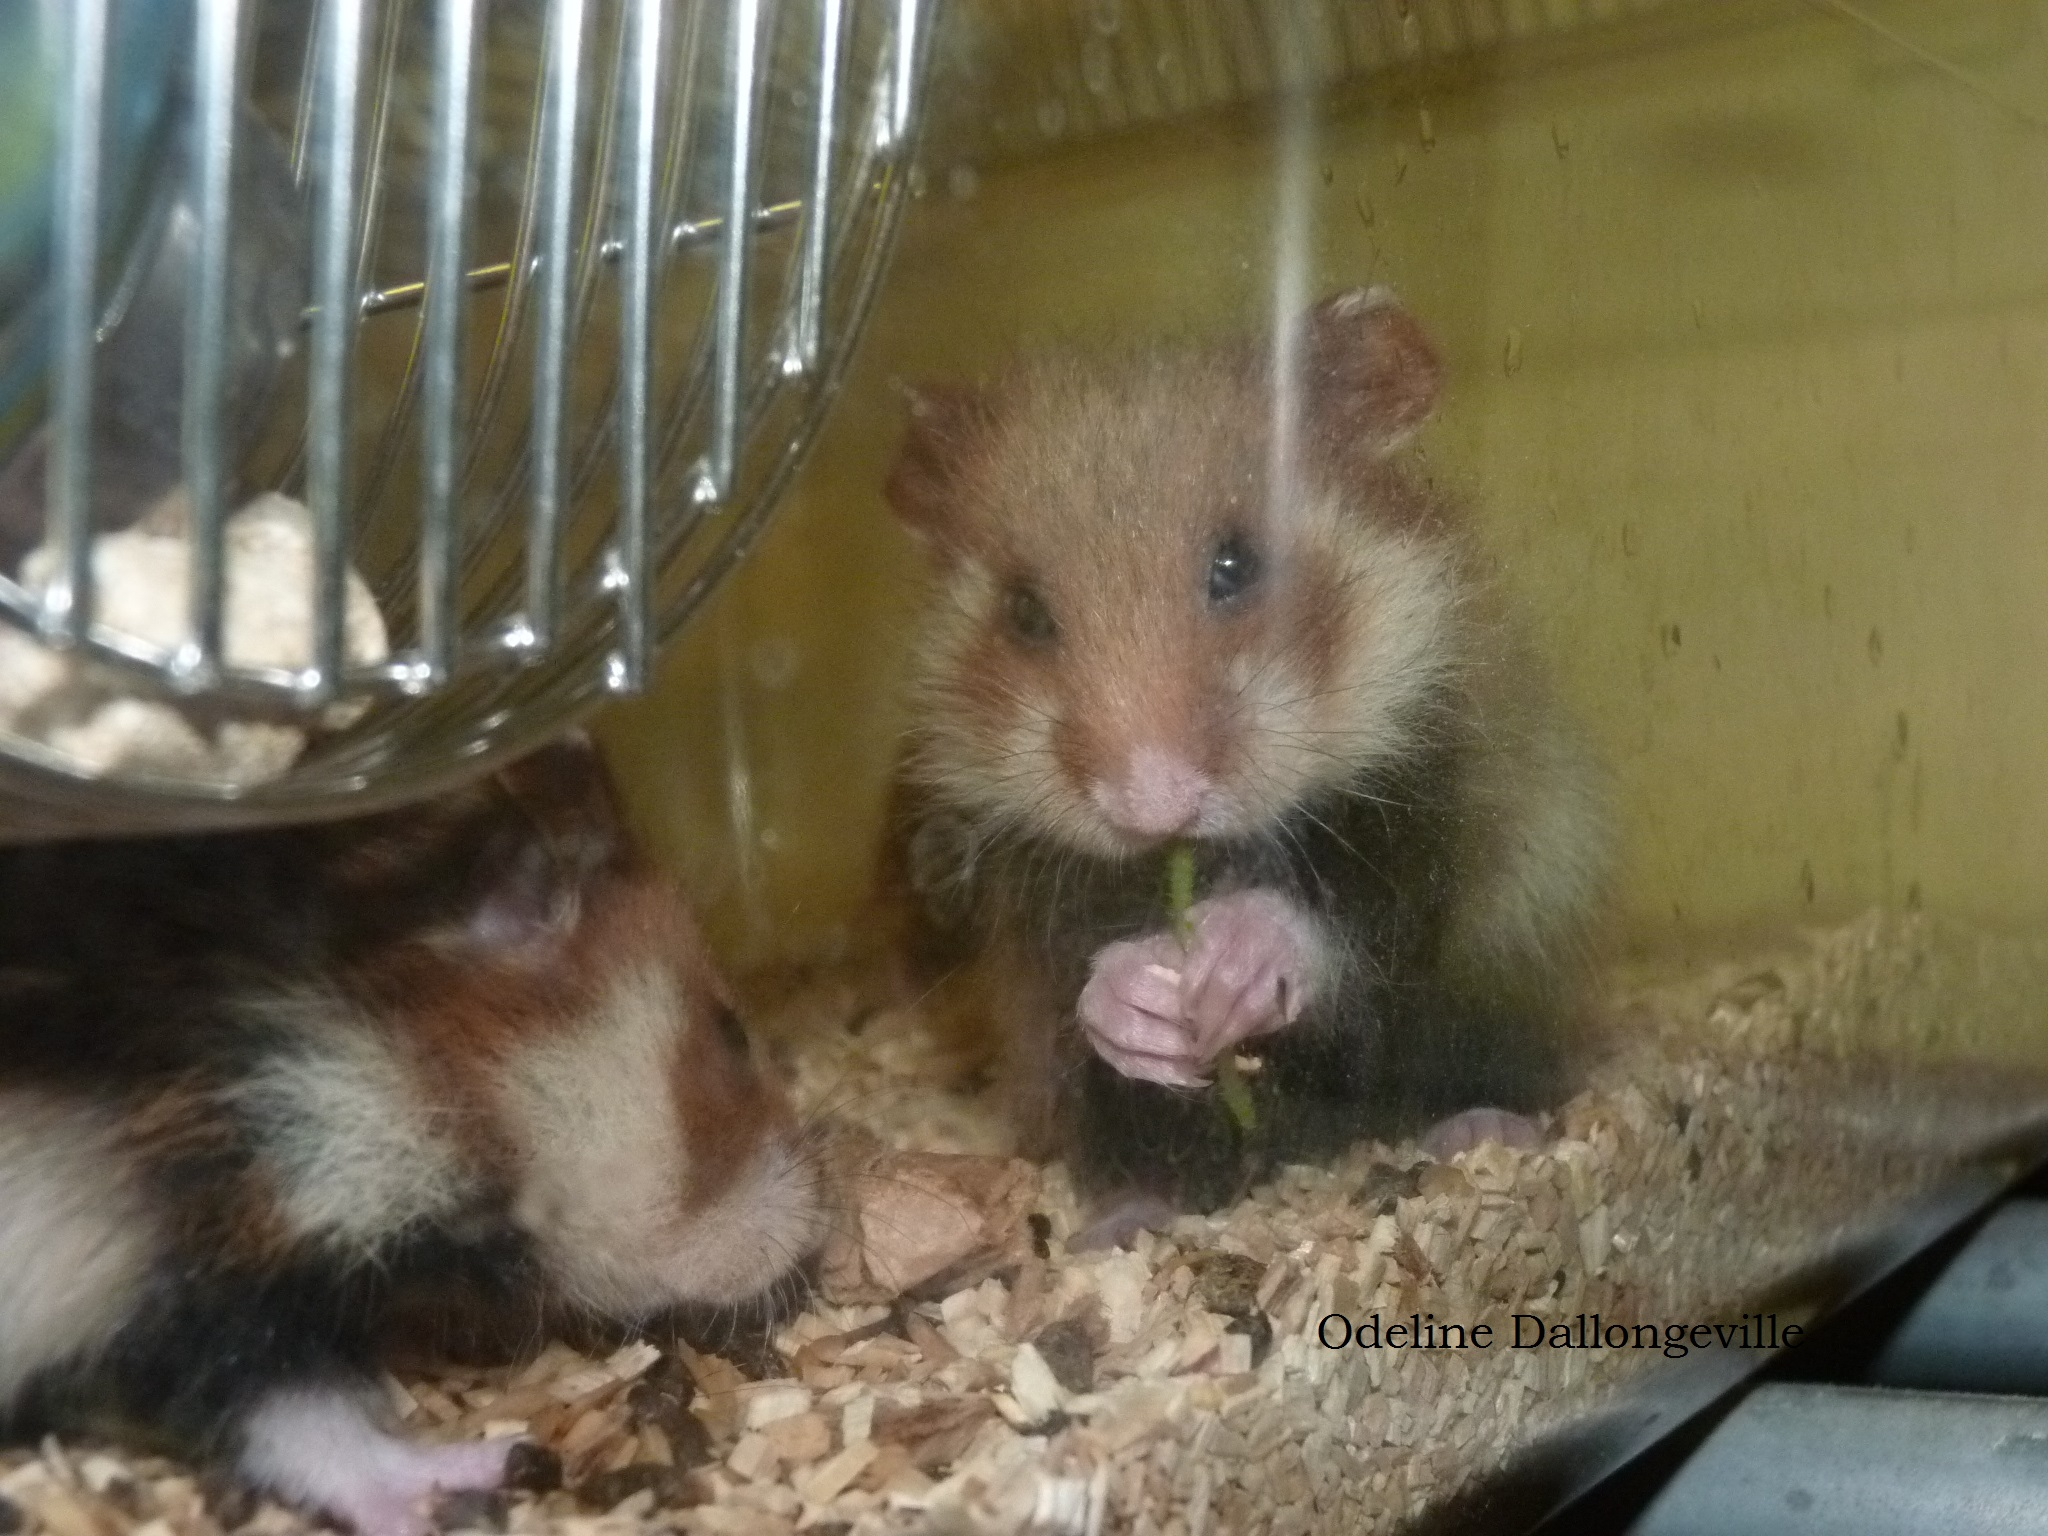 Femelle mangeant du trèfle